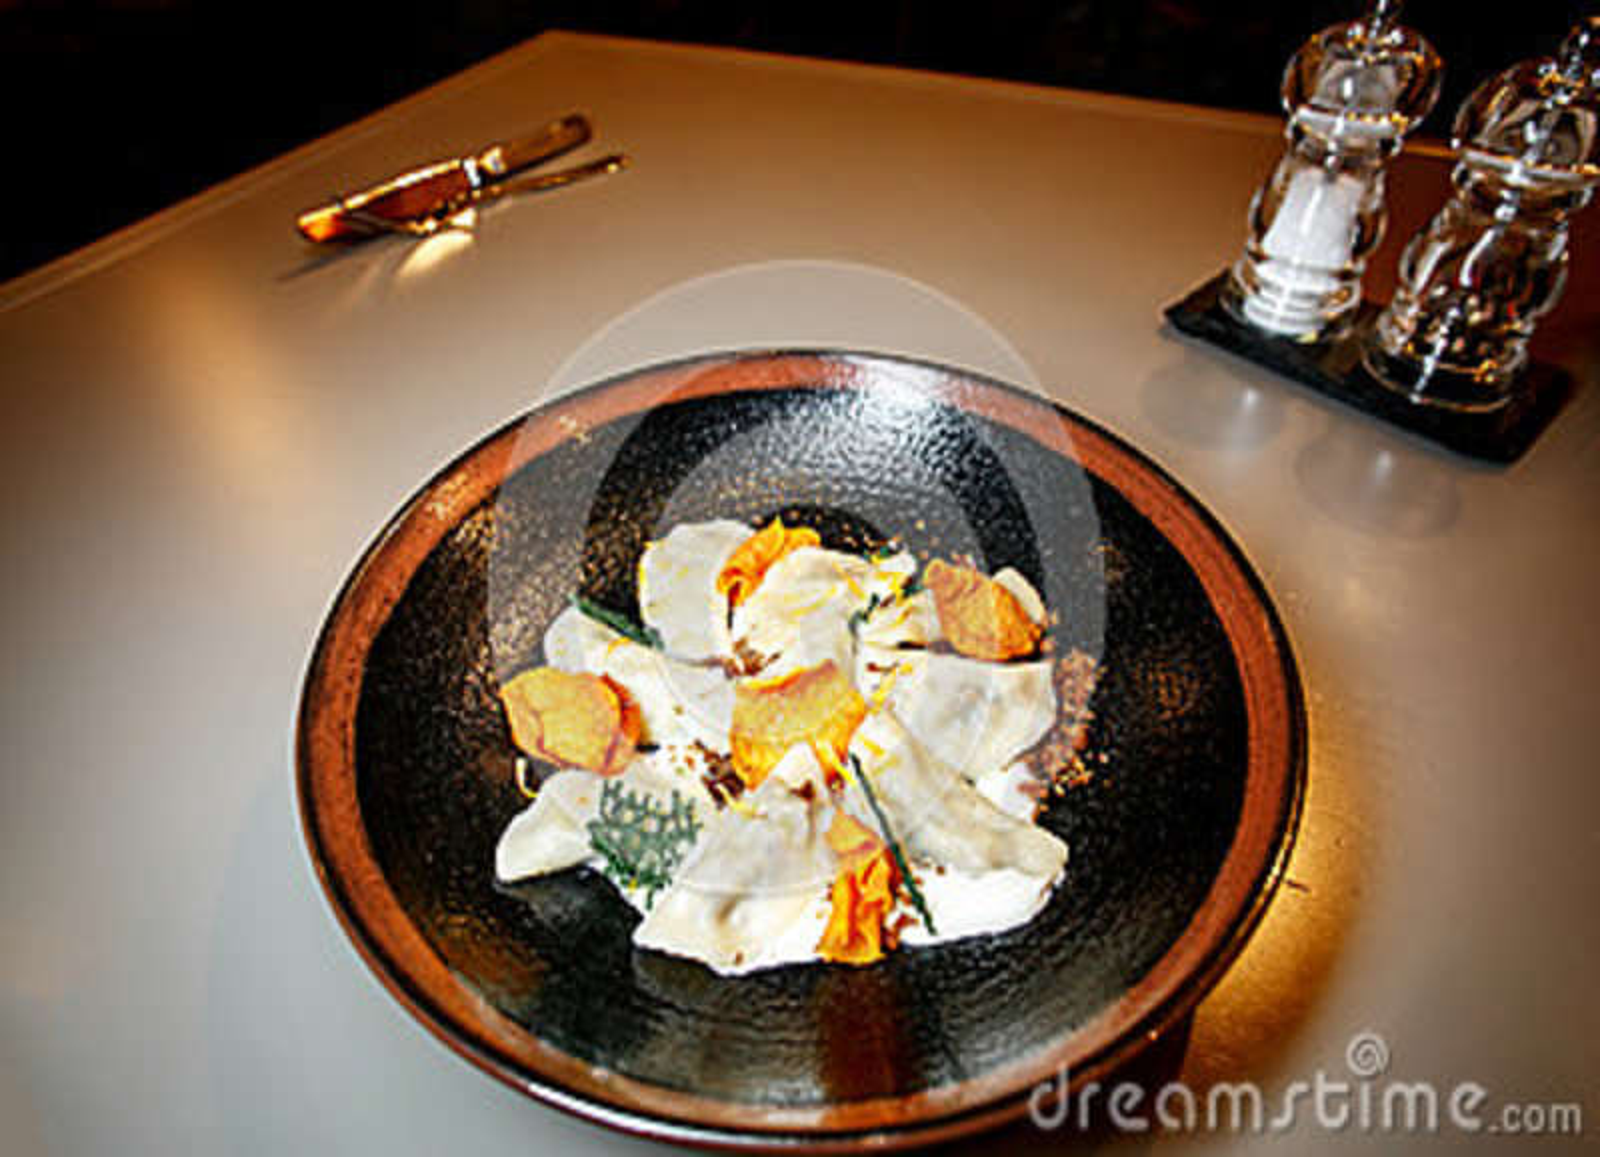 Dumplings, homemade ravioli in a plate on black background